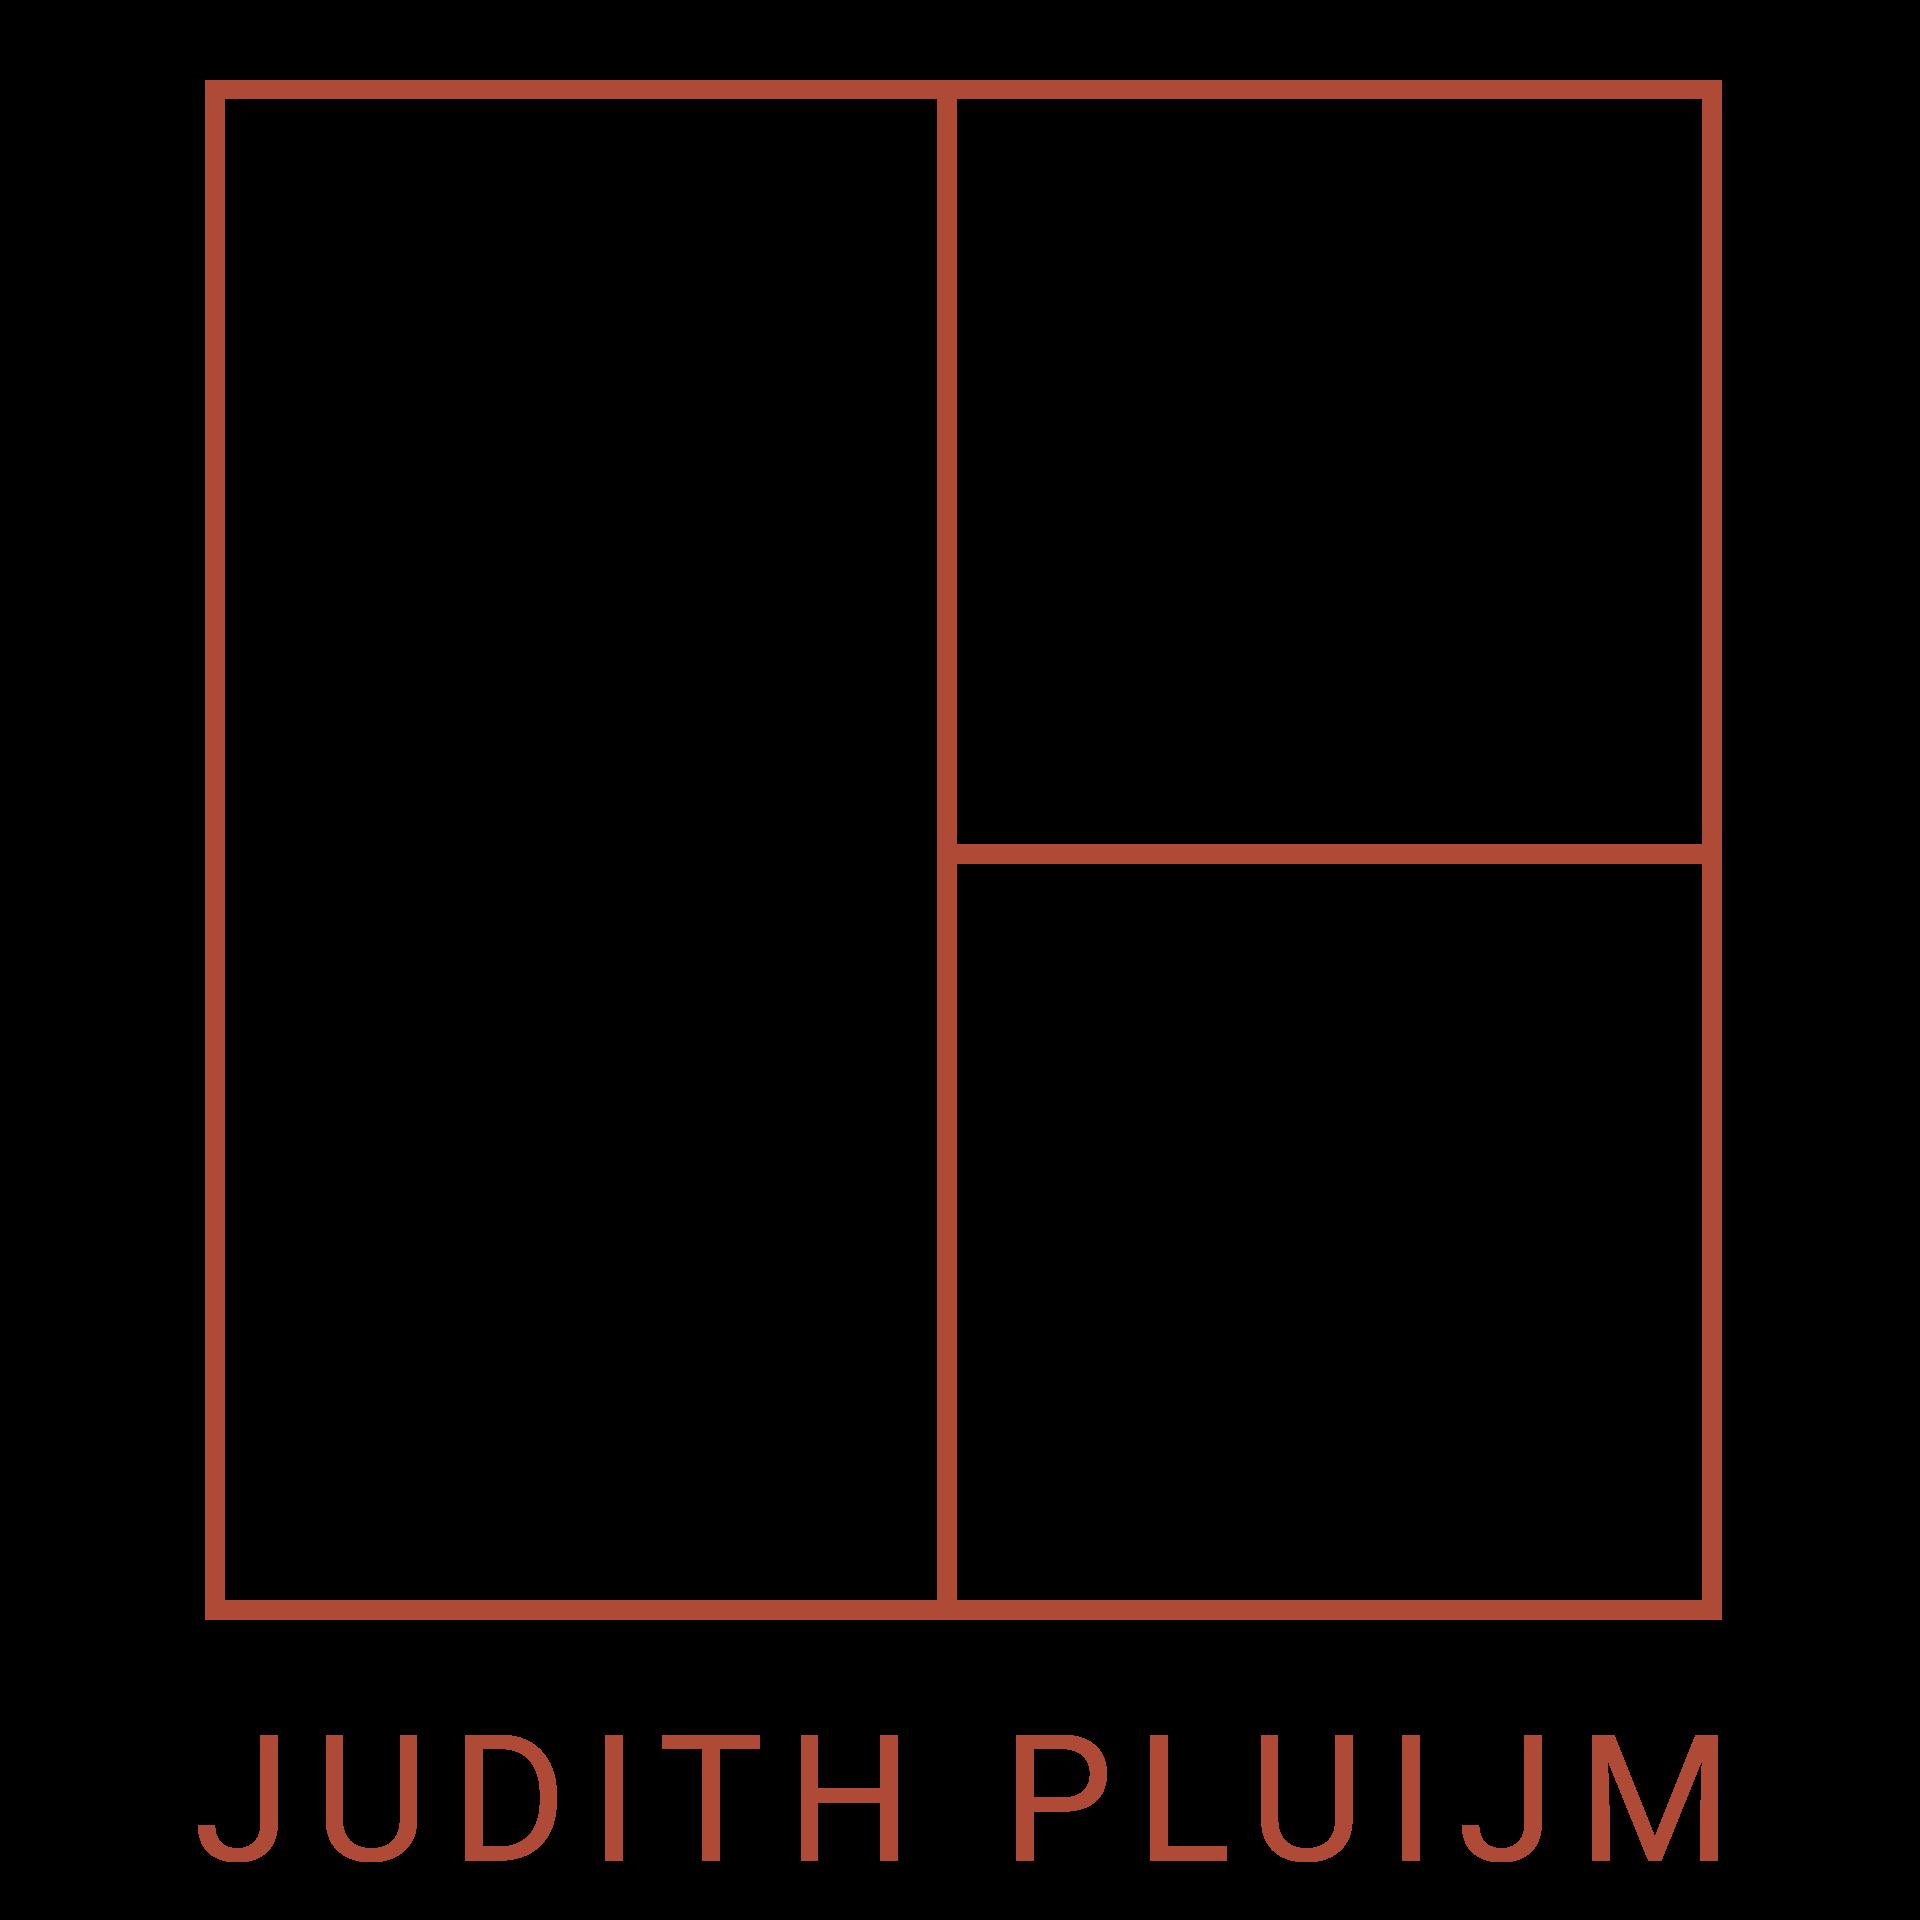 Judith Pluijm